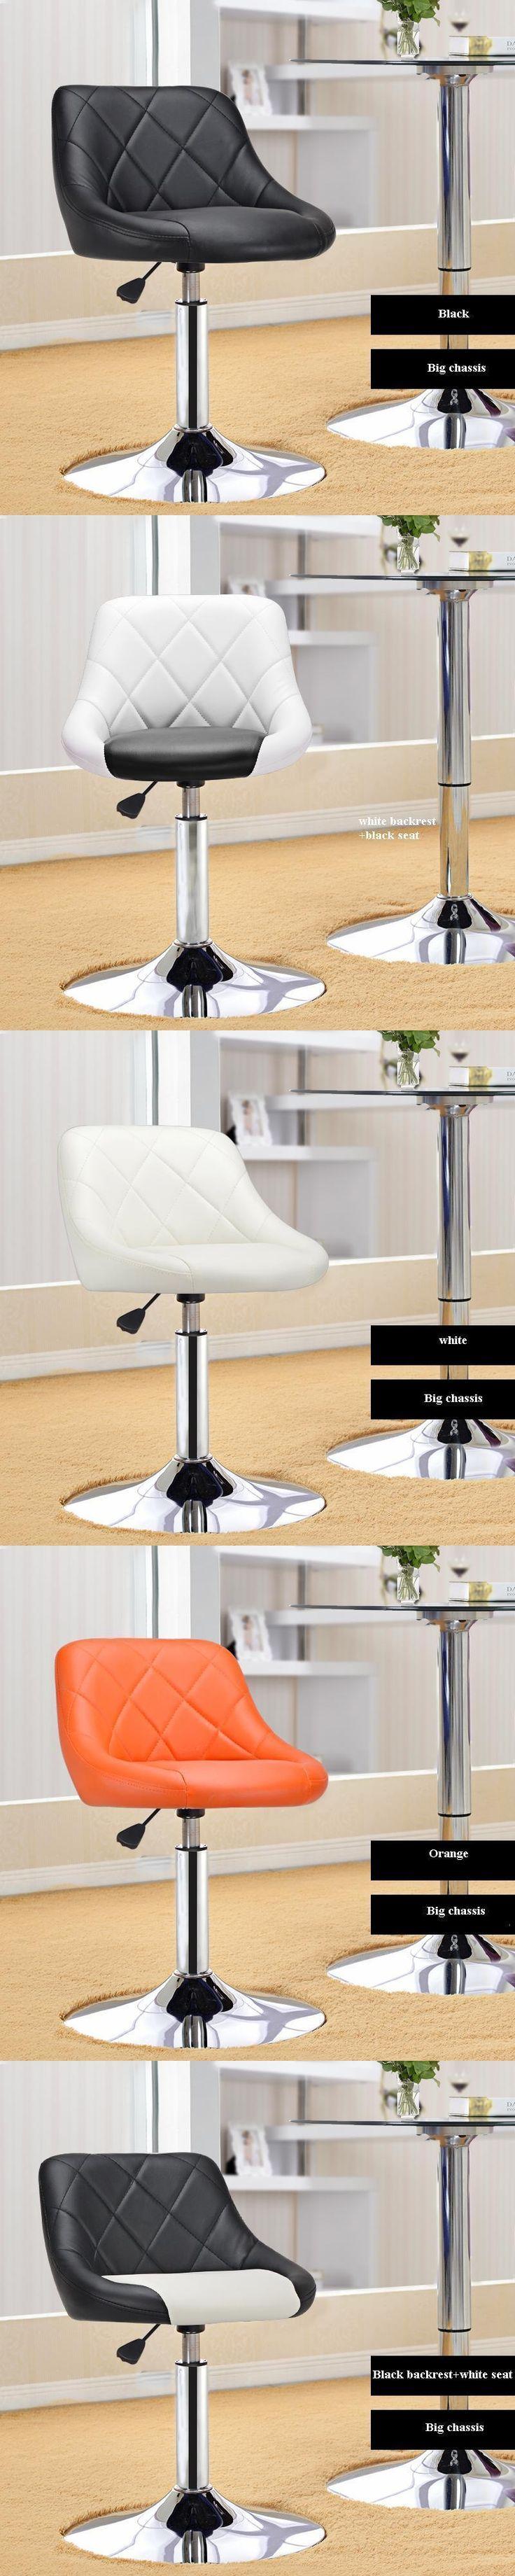 02f7d475d5012d4302e7e21a8a879f69 Impressionnant De Table Bar Exterieur Conception